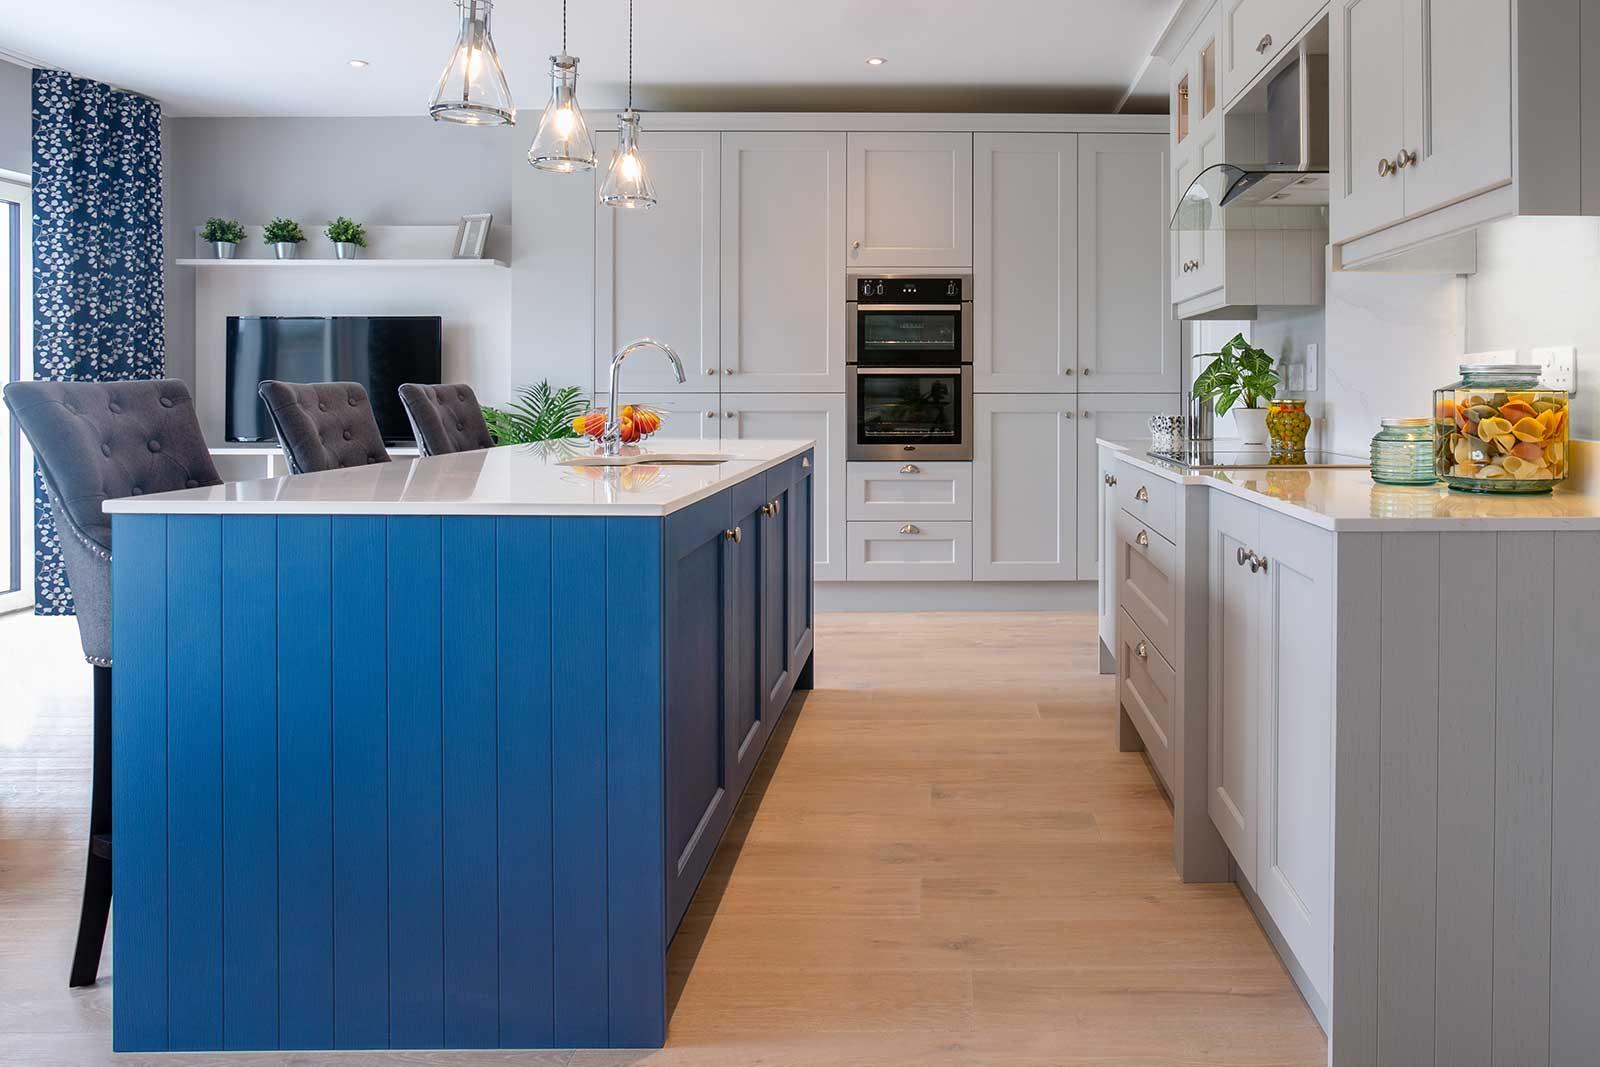 Carton-Interiors_P3_3_Open-plan-kitchen